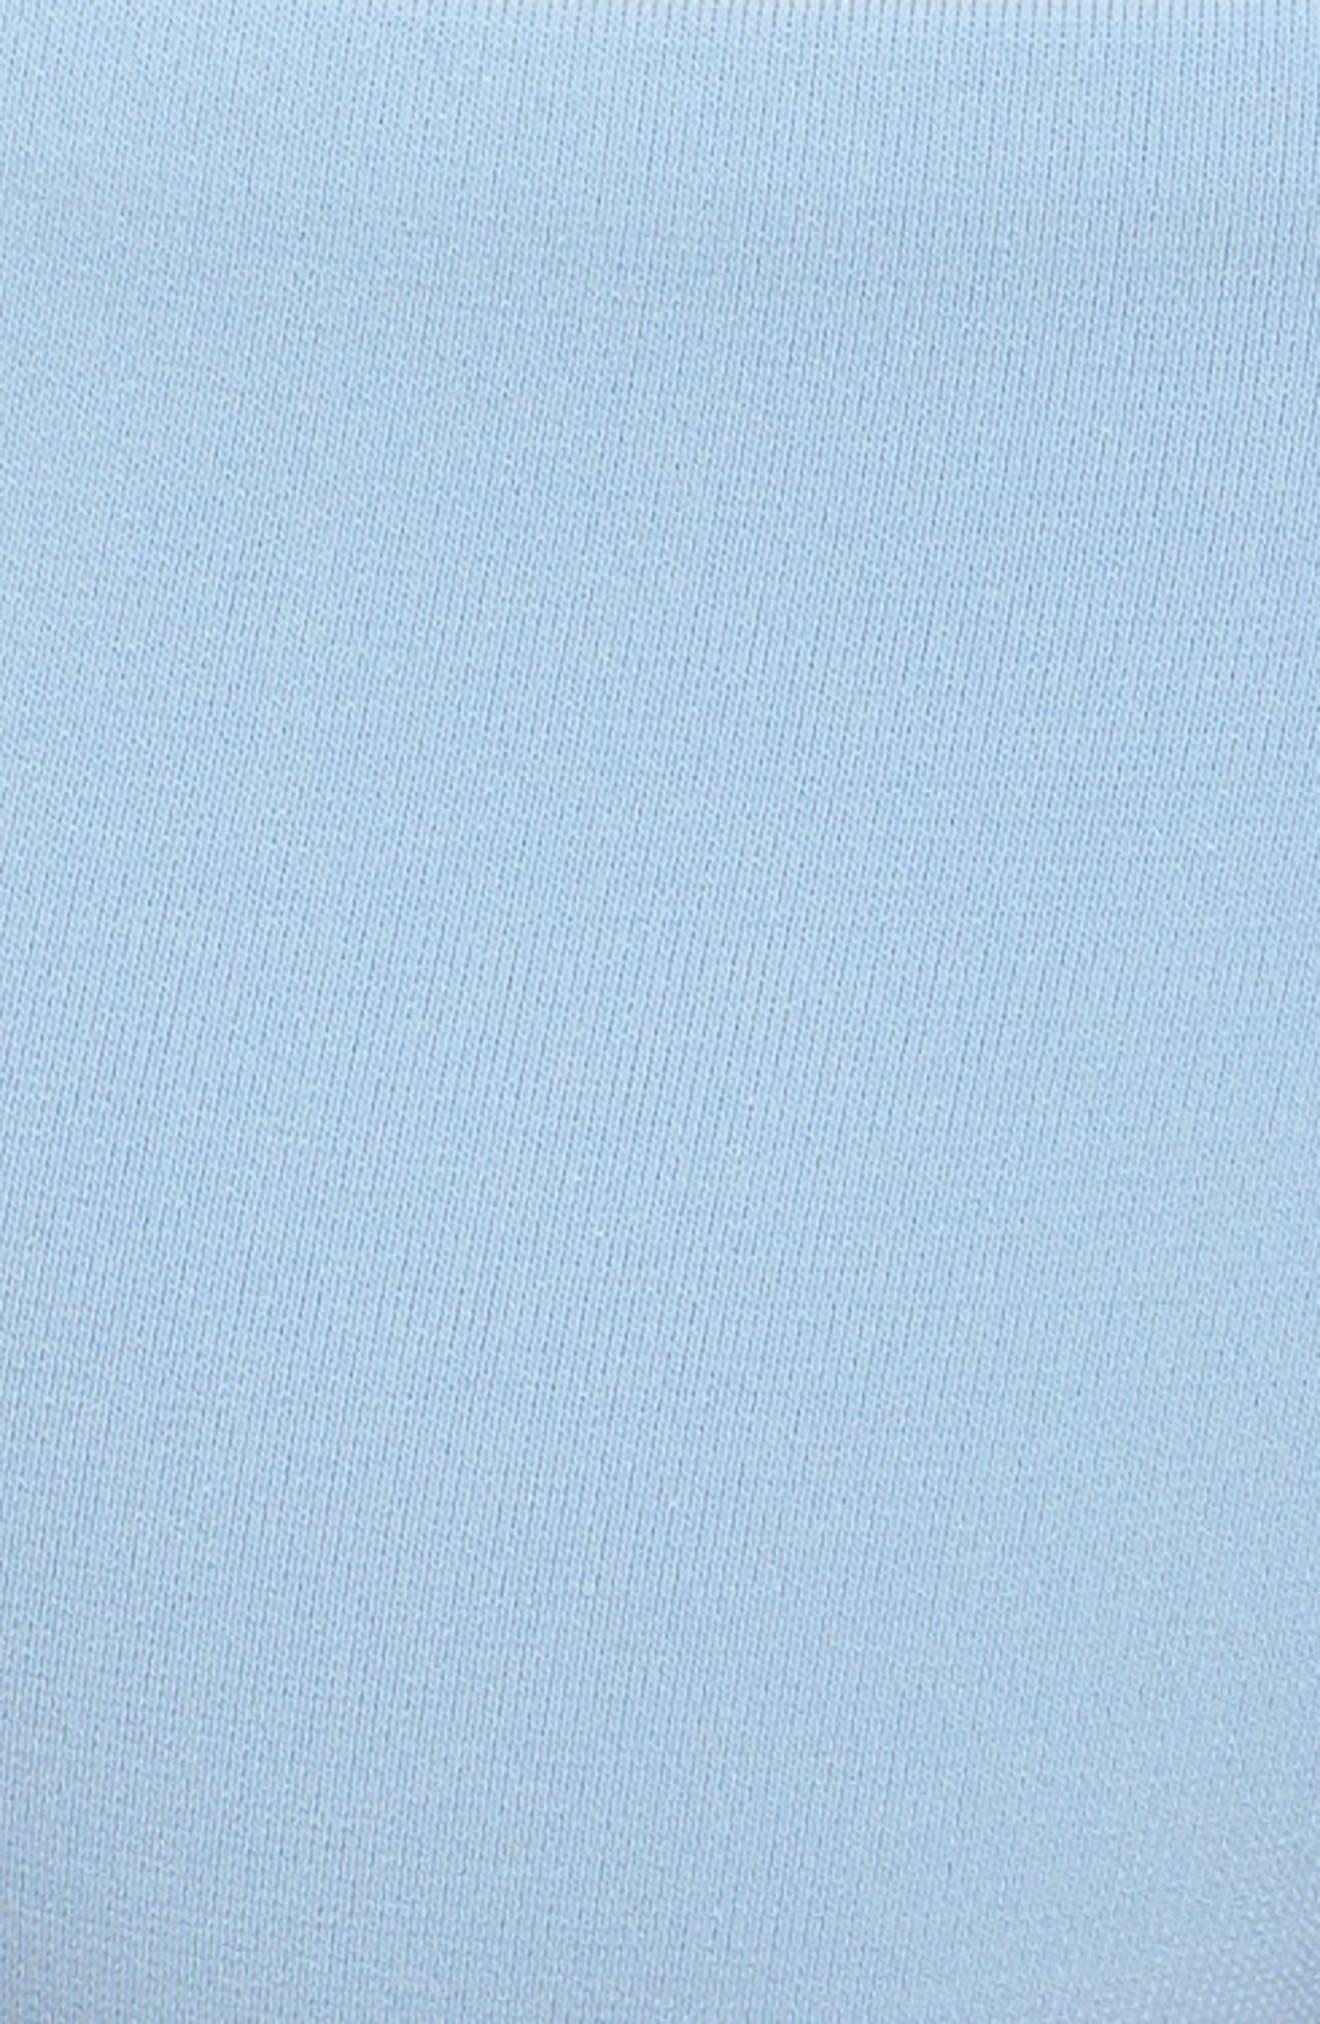 'Sophia' Crochet Halter Bikini Top,                             Alternate thumbnail 22, color,